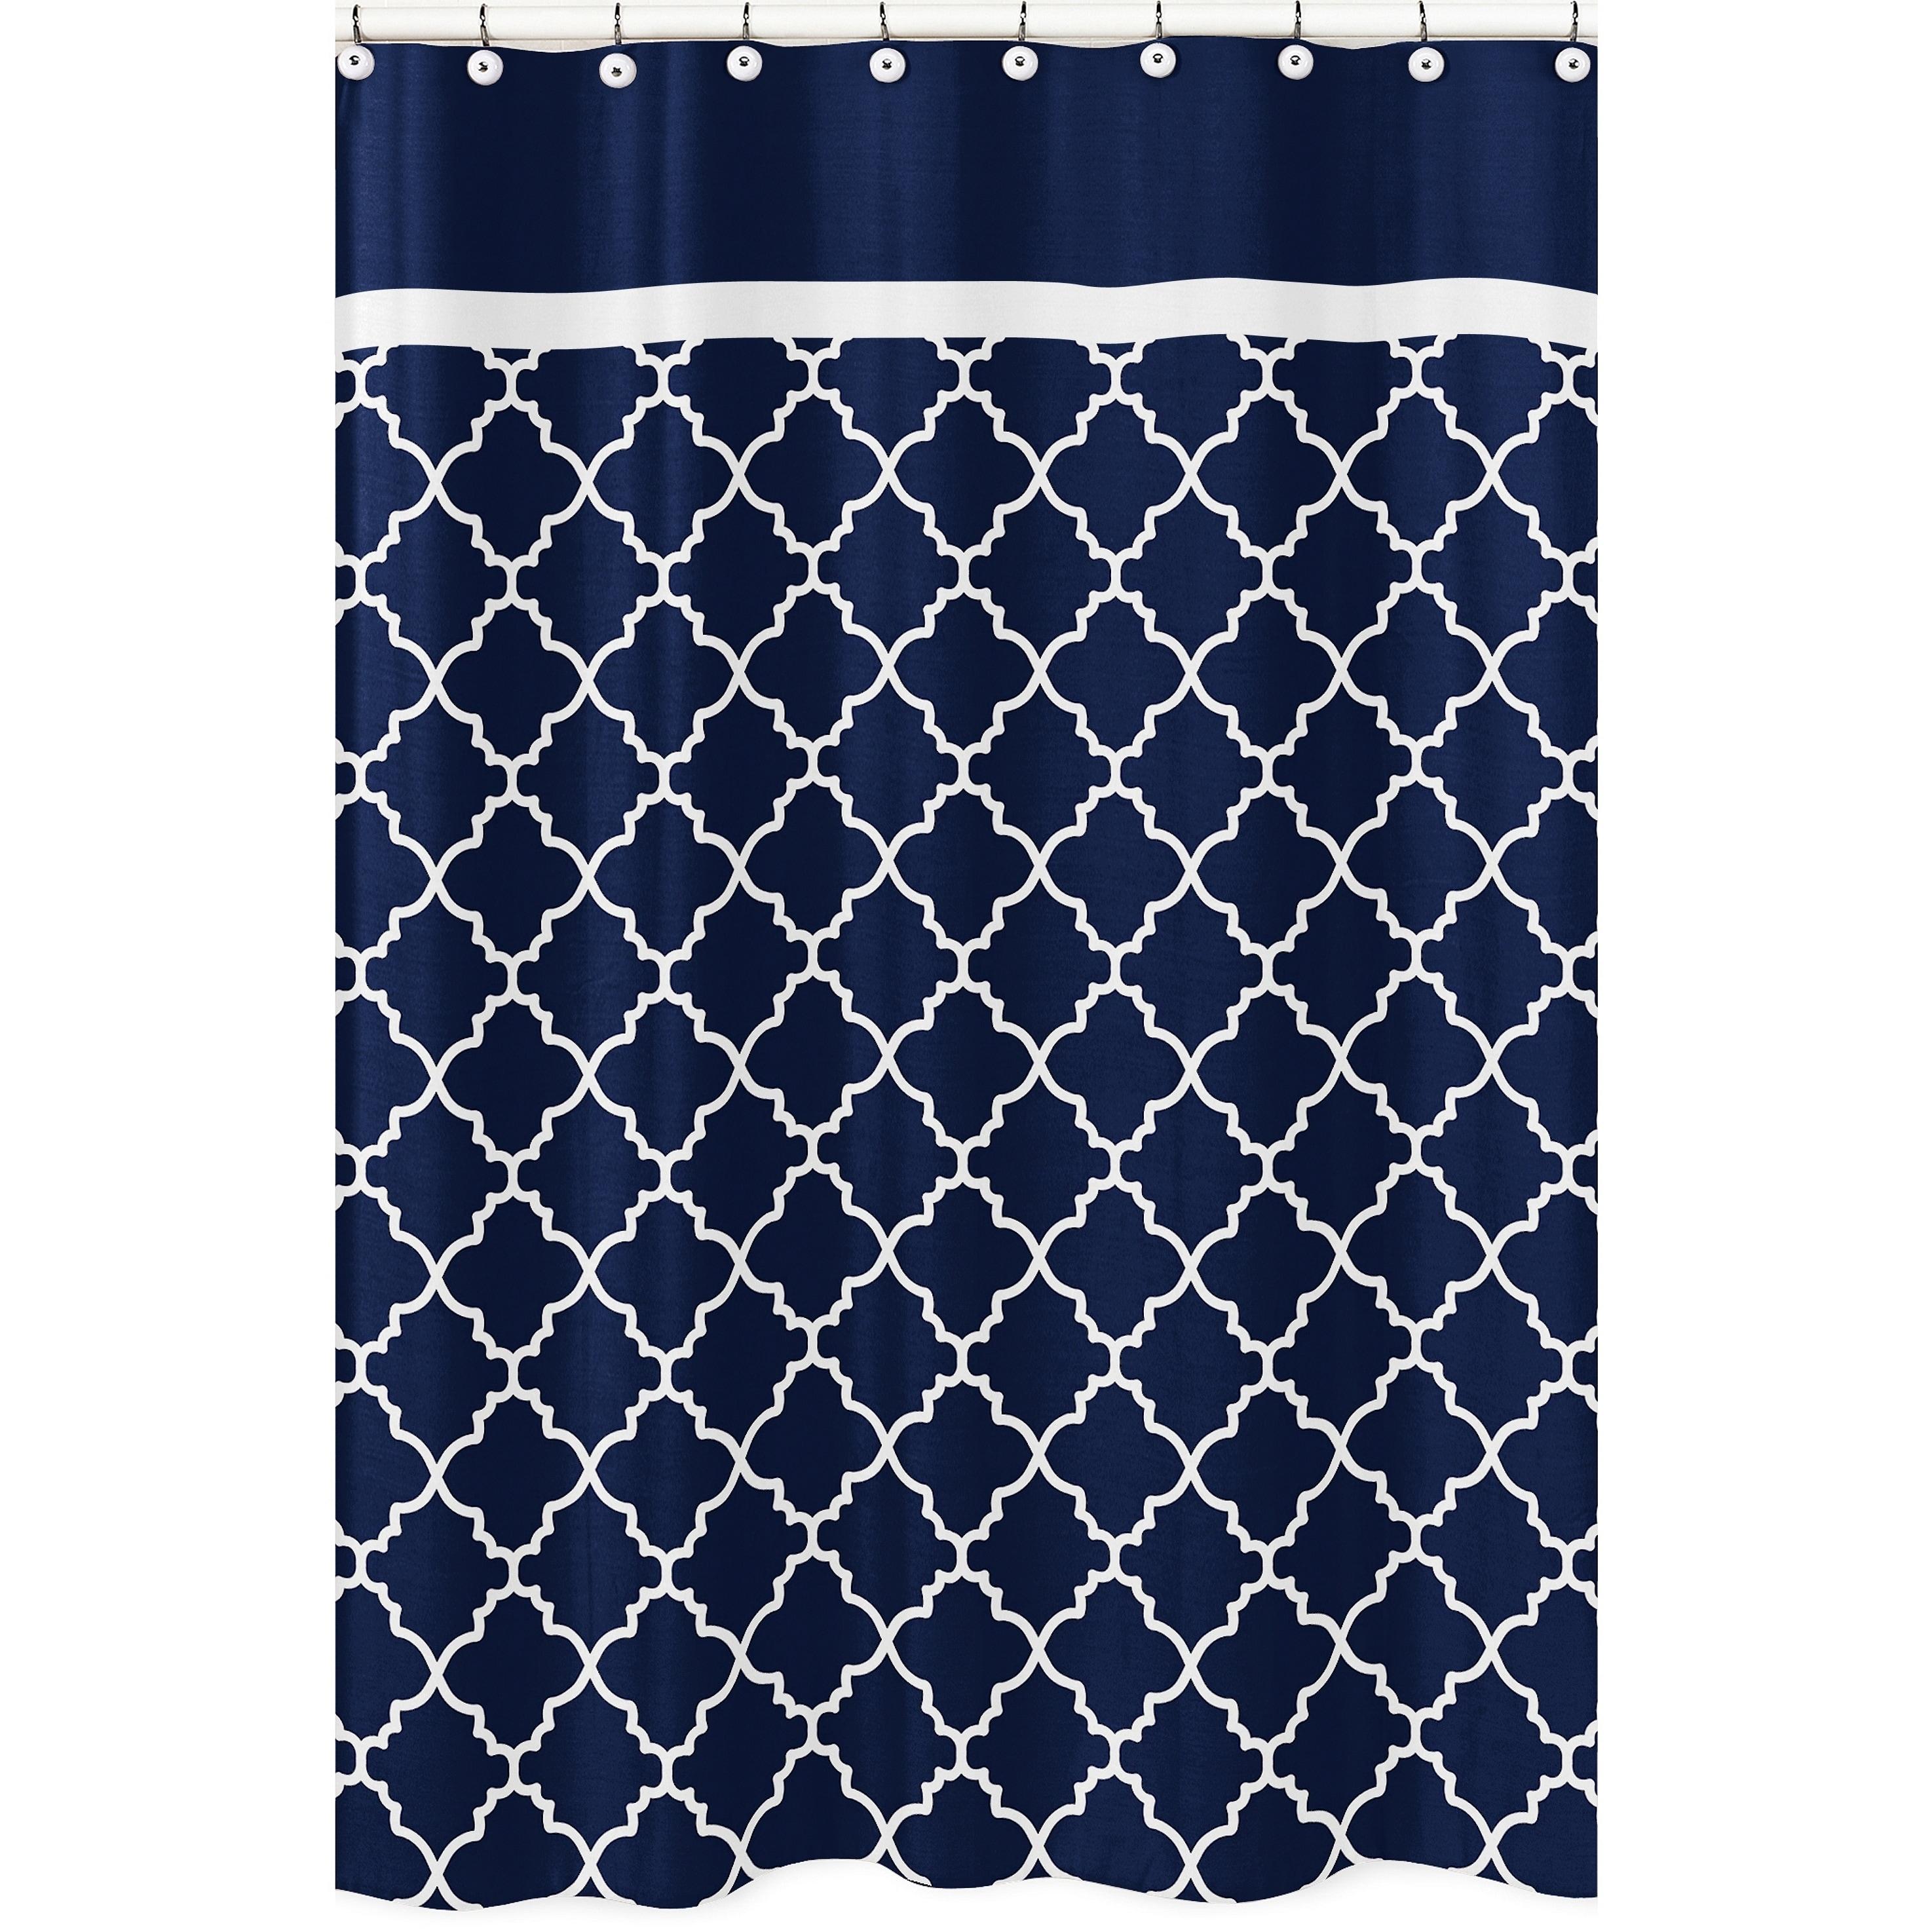 Sweet Jojo Designs Navy Blue and White Modern Trellis Lattice ...